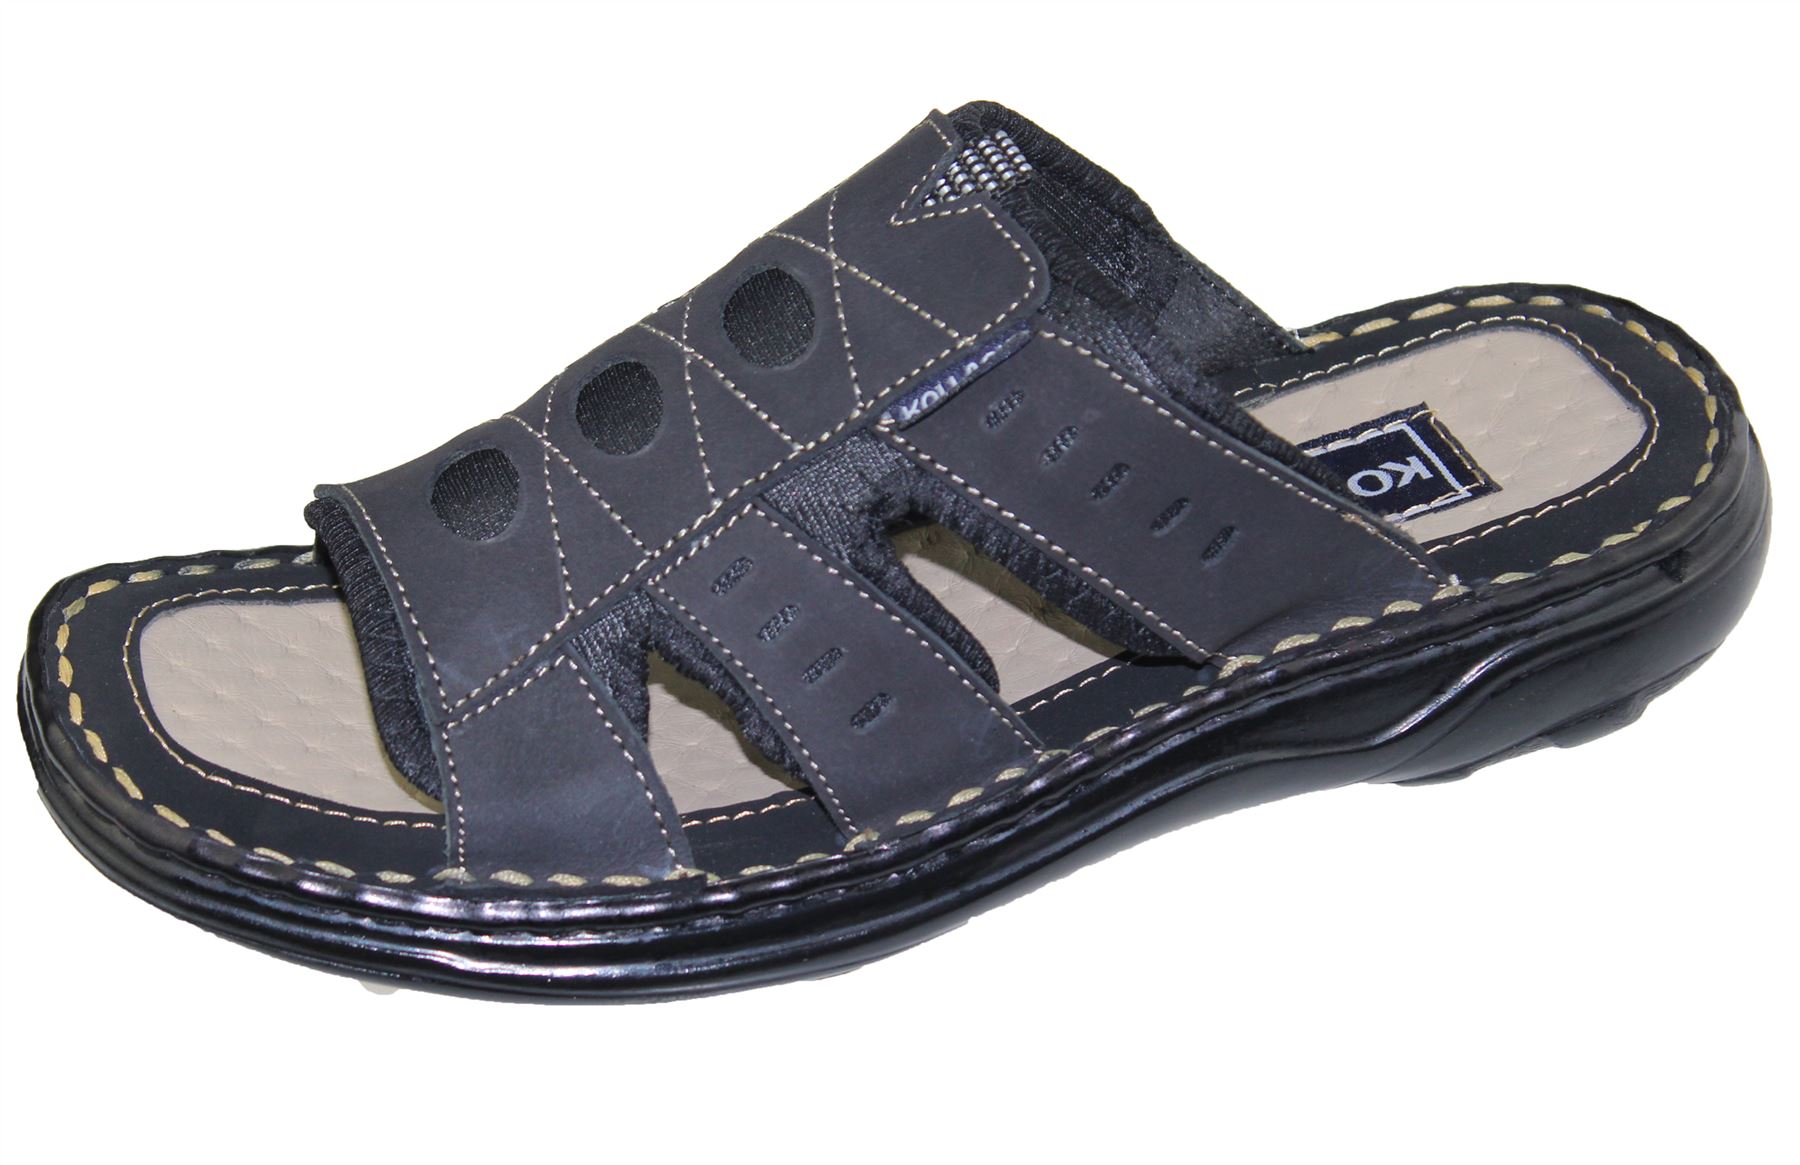 Mens-Slipper-Sandal-Sports-Beach-Buckle-Walking-Fashion-Summer-Casual-Shoes-Size miniatura 8